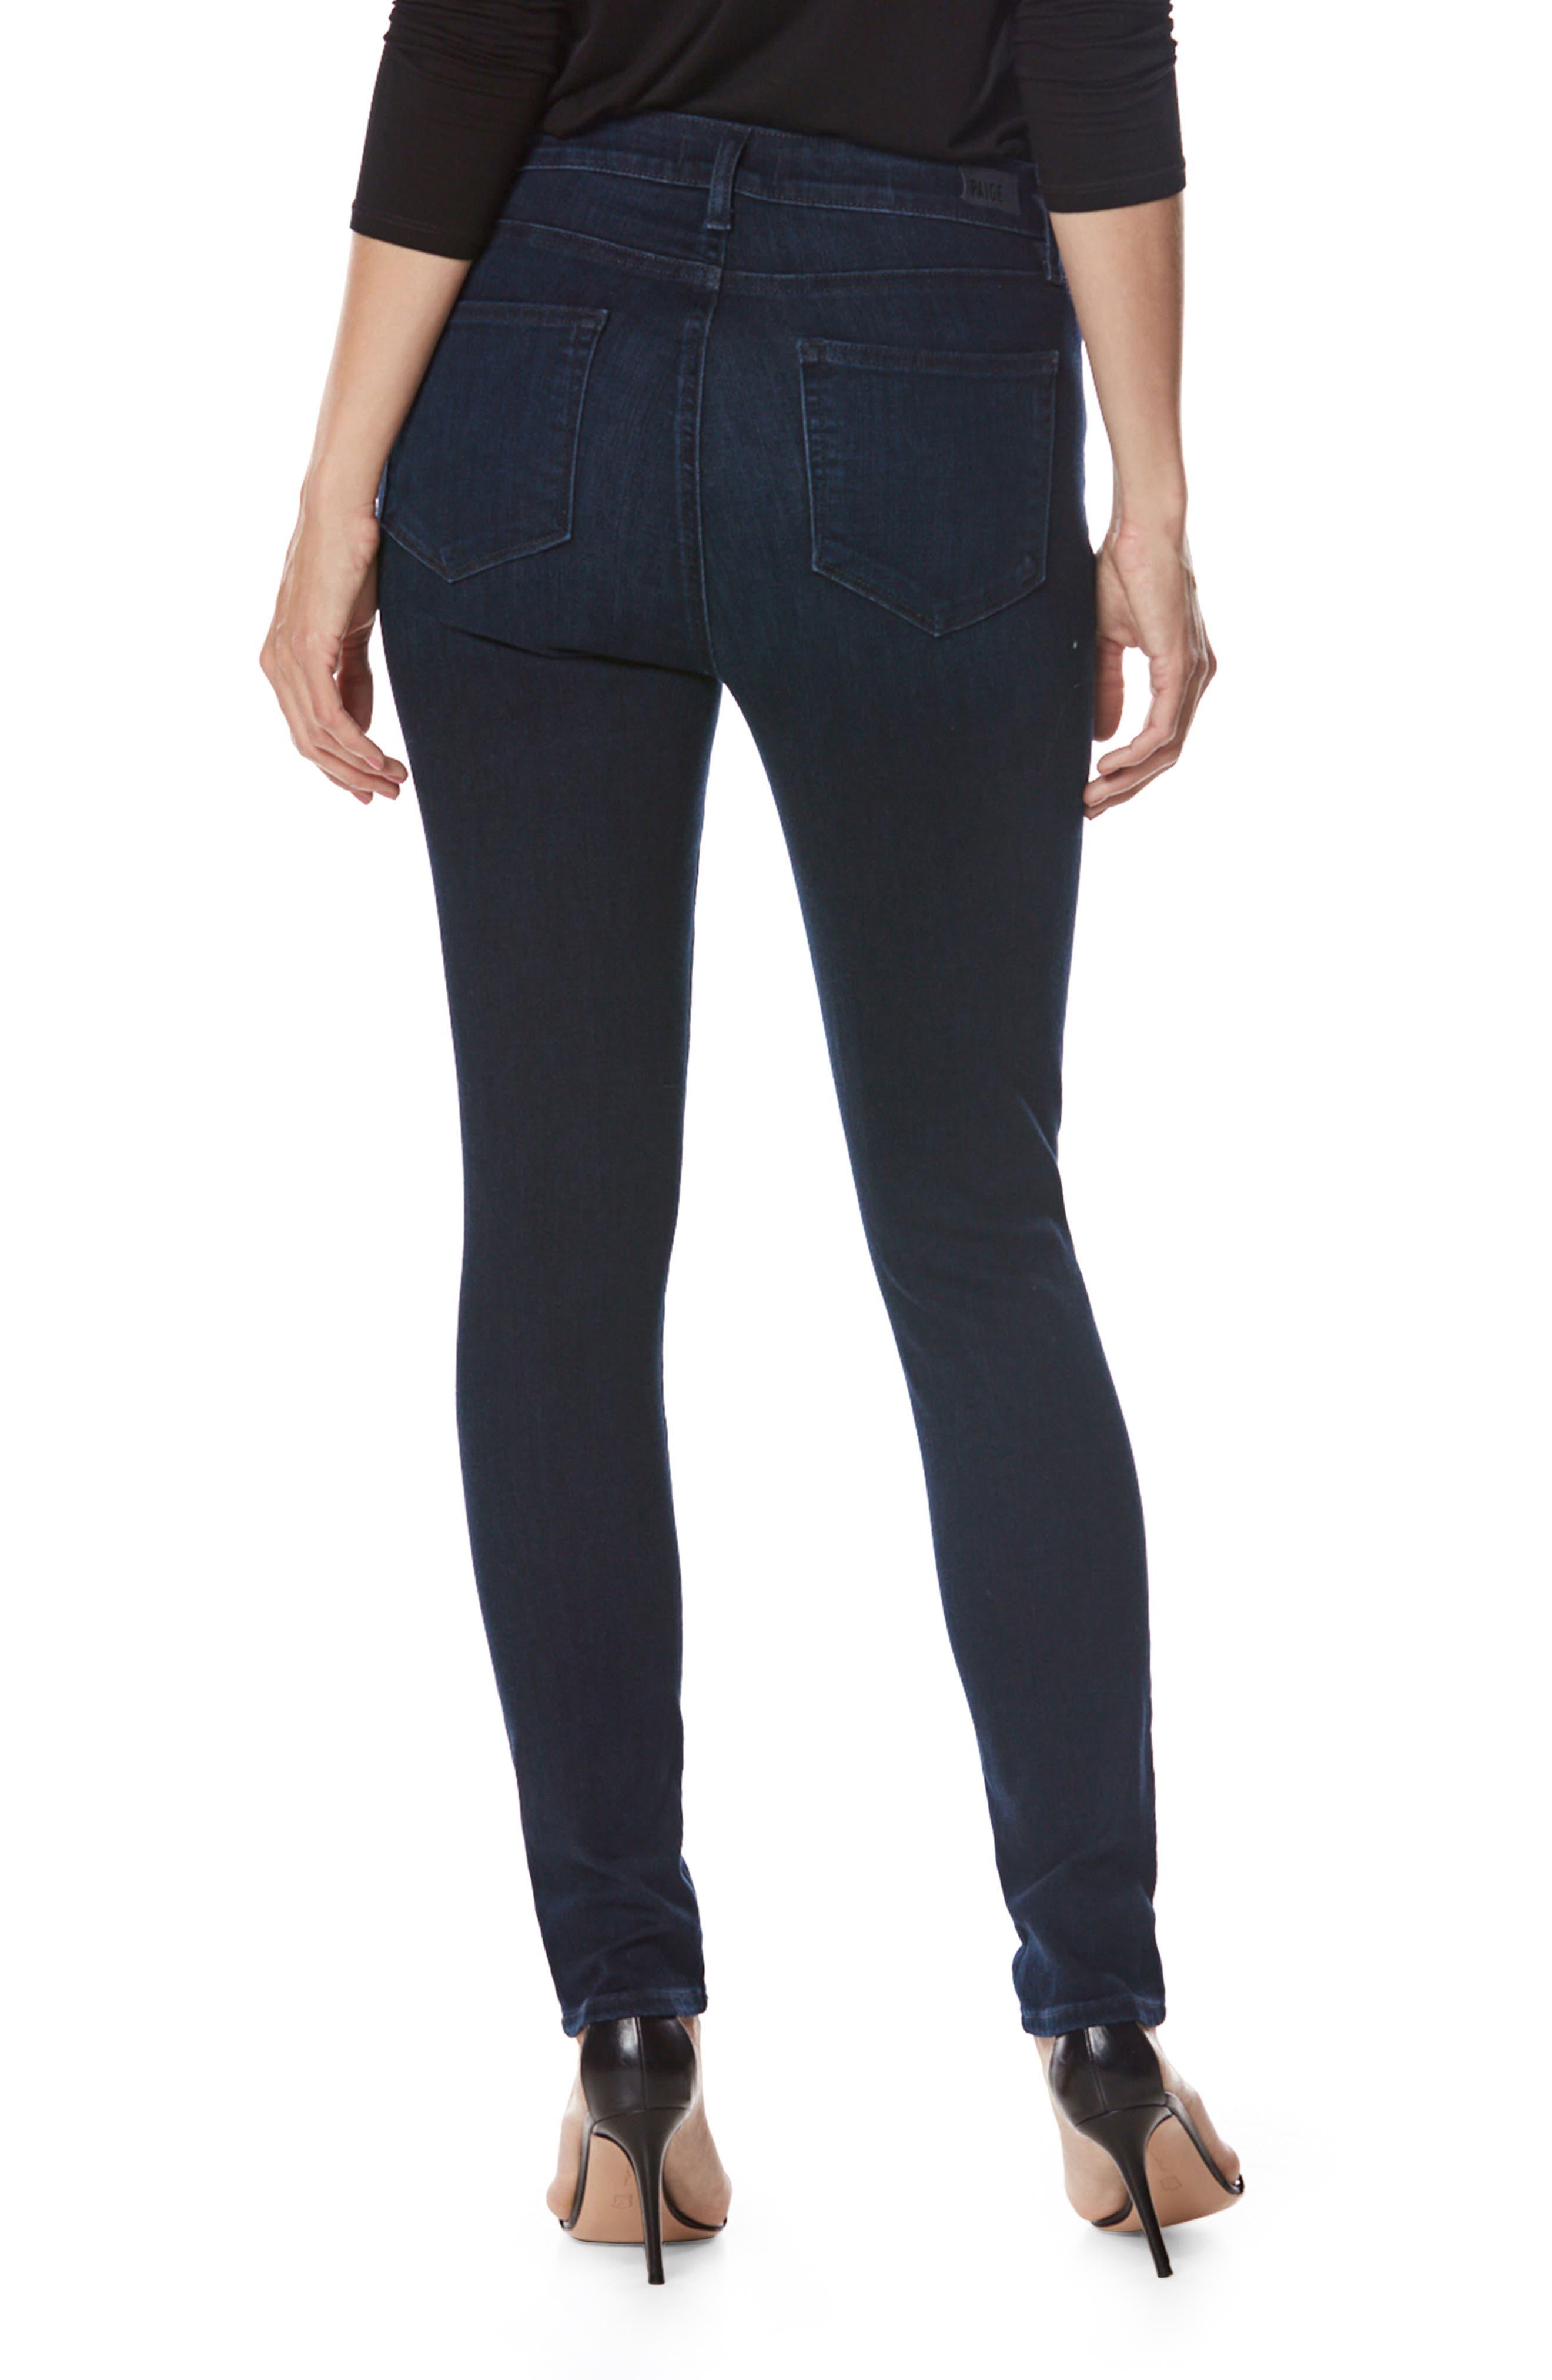 Transcend - Hoxton High Waist Ultra Skinny Jeans,                             Alternate thumbnail 2, color,